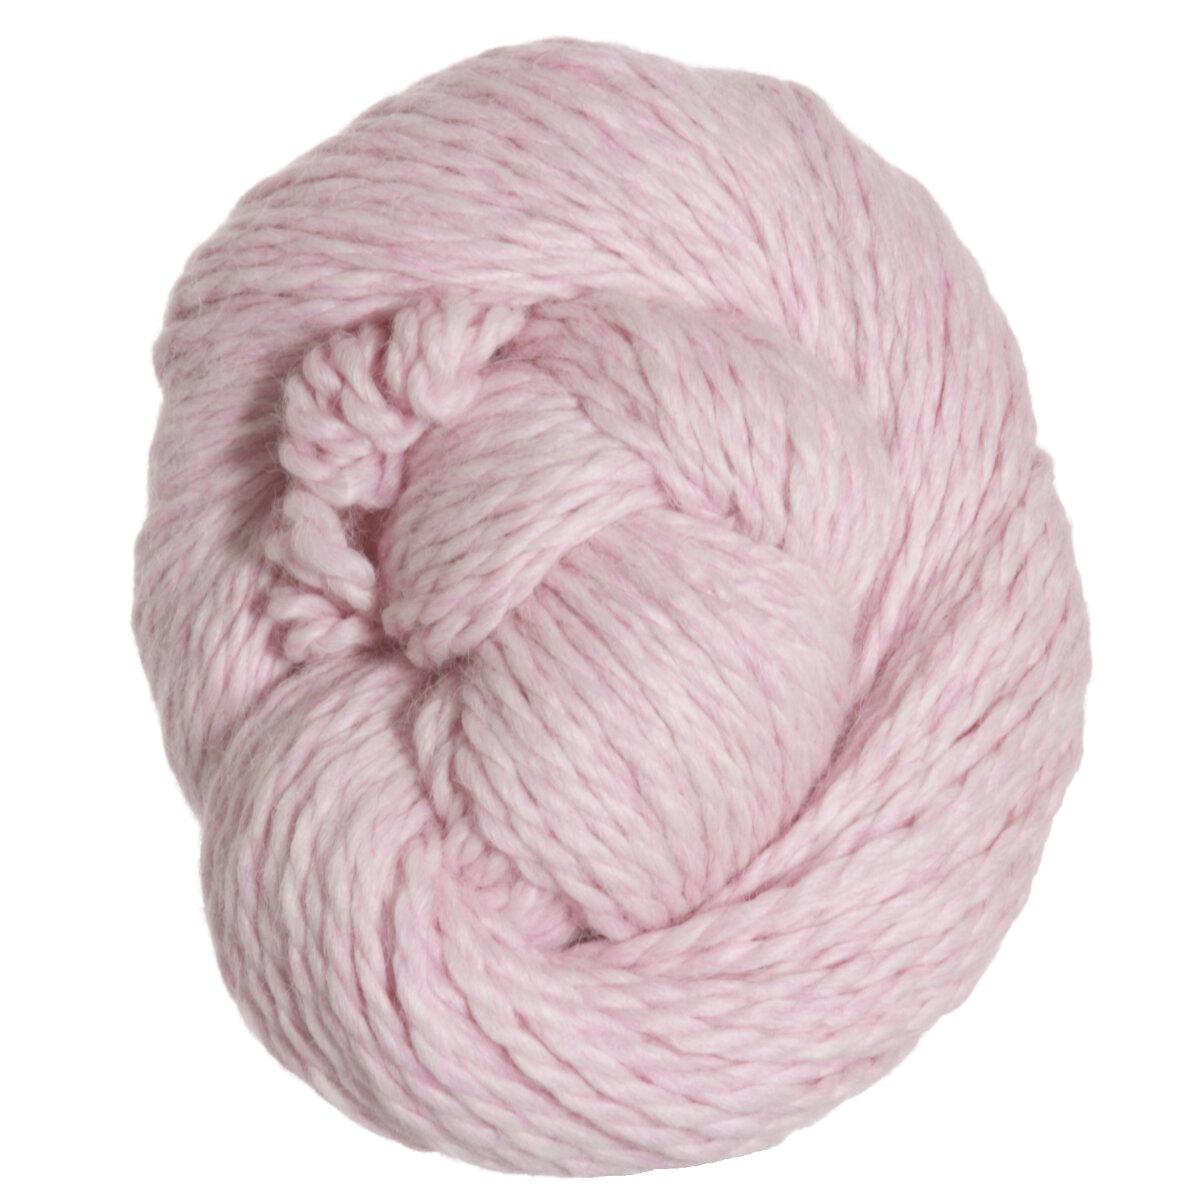 12d8fd3fa Cascade Baby Alpaca Chunky Yarn - 587 - Pink Taffy Heather at Jimmy ...